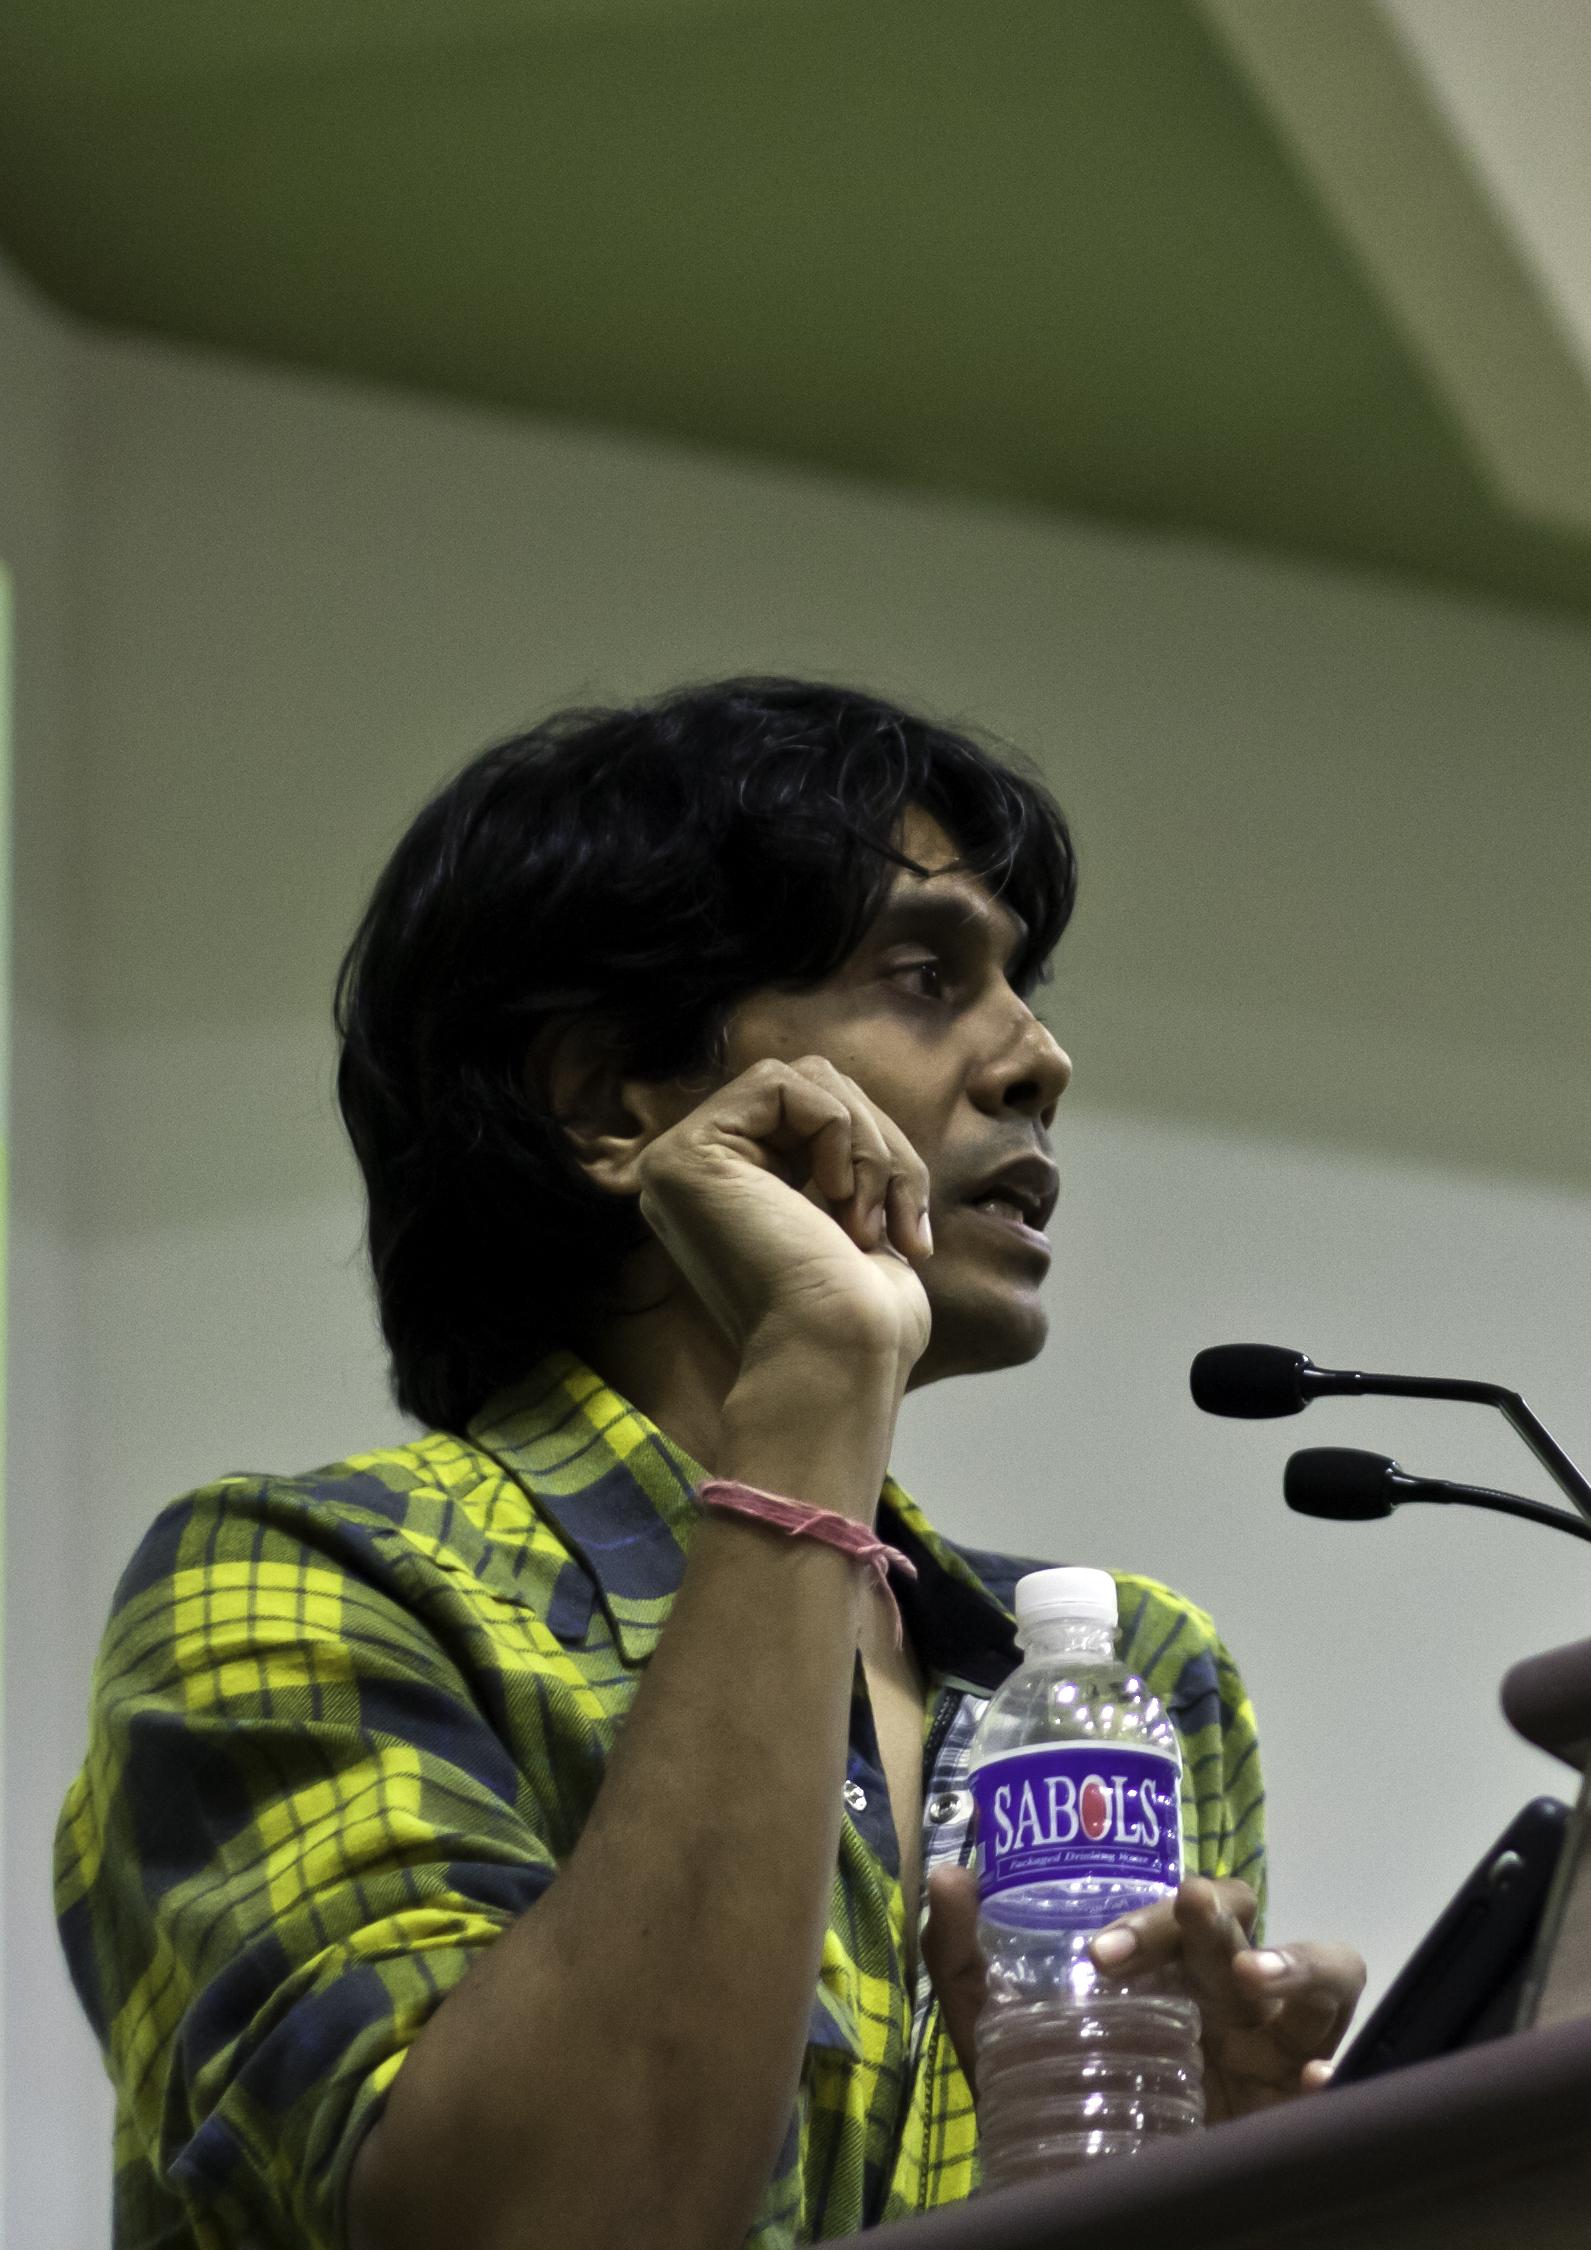 Photograph of Nagesh Kukunoor